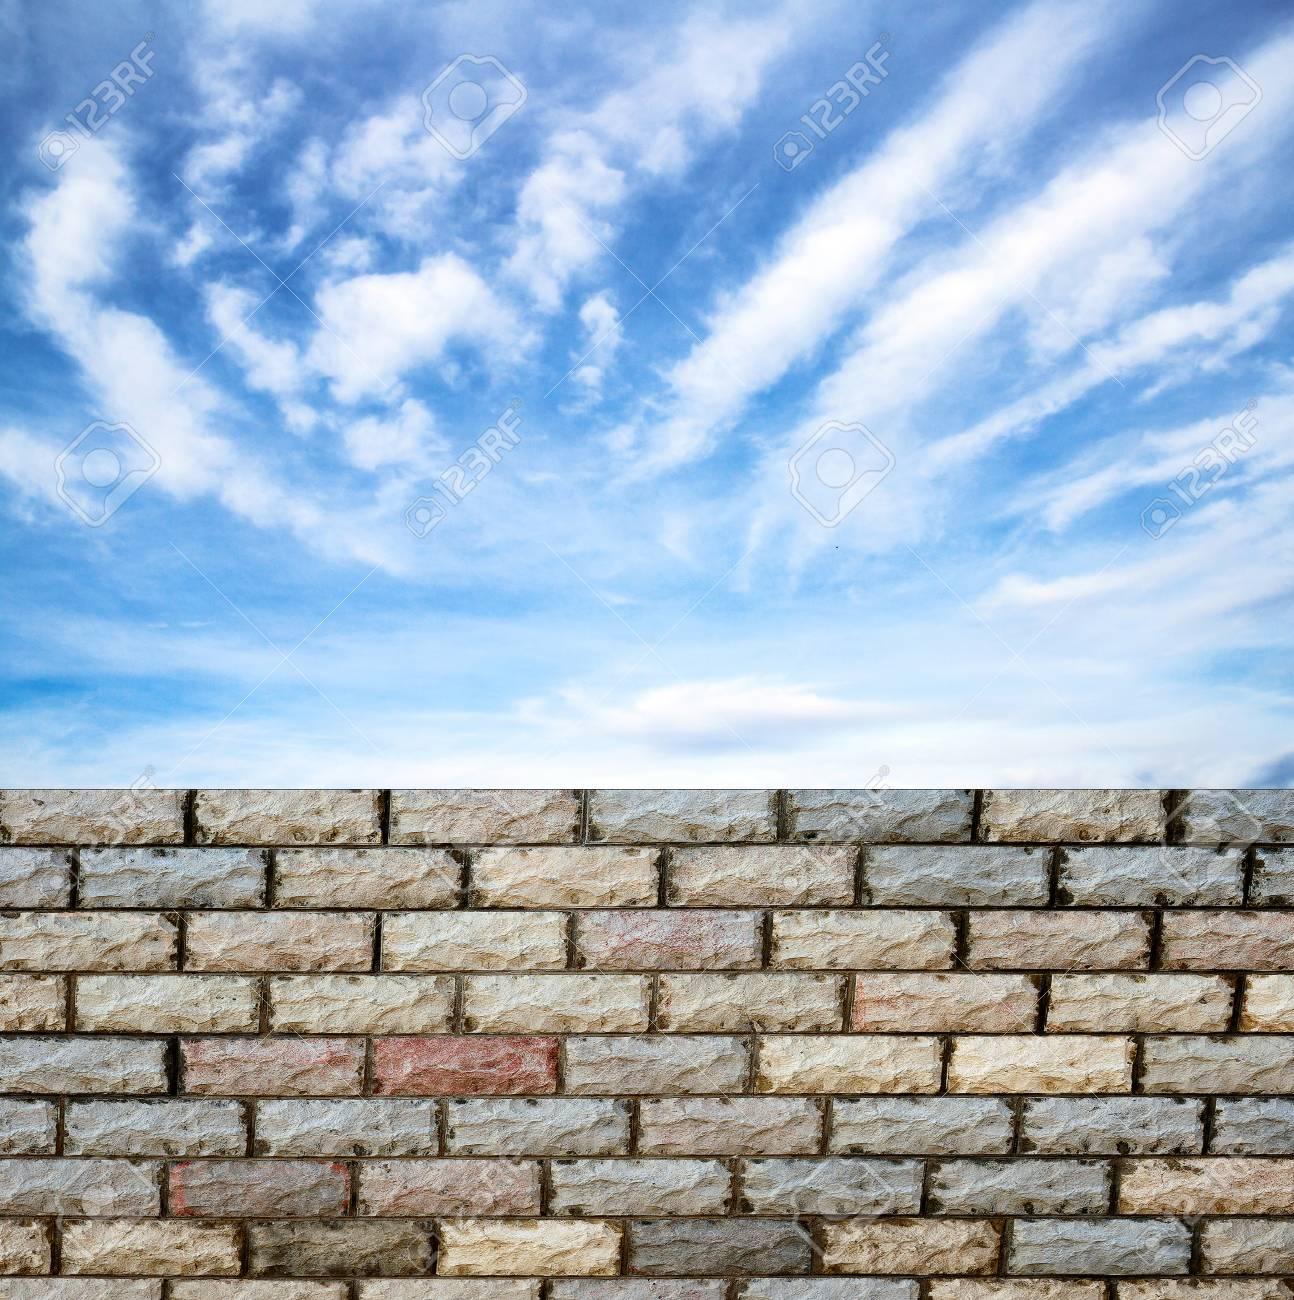 Dekorative Ziegelmauer Wand Gegen Blauen Himmel Standard Bild   27053768